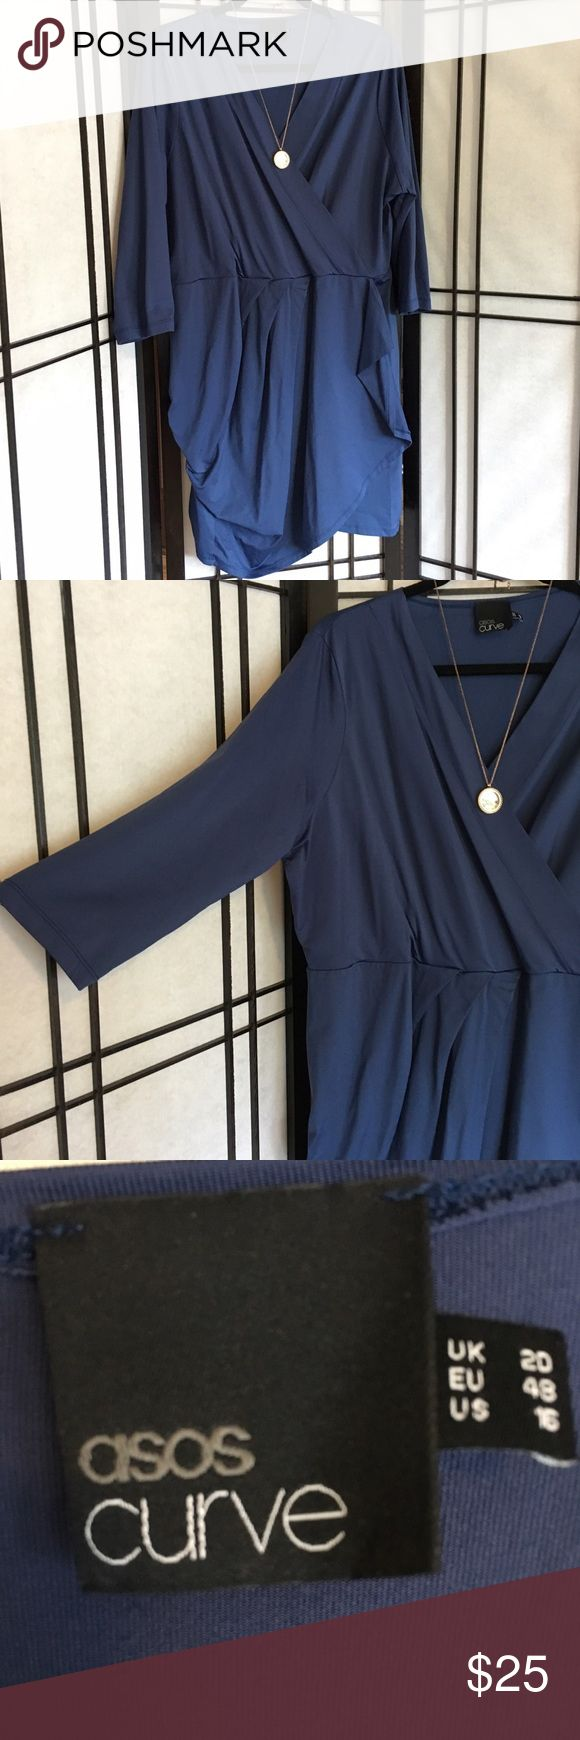 Asos Dress - Steel Blue Asos Curve mini dress with faux wrap and v-neck Dresses Mini